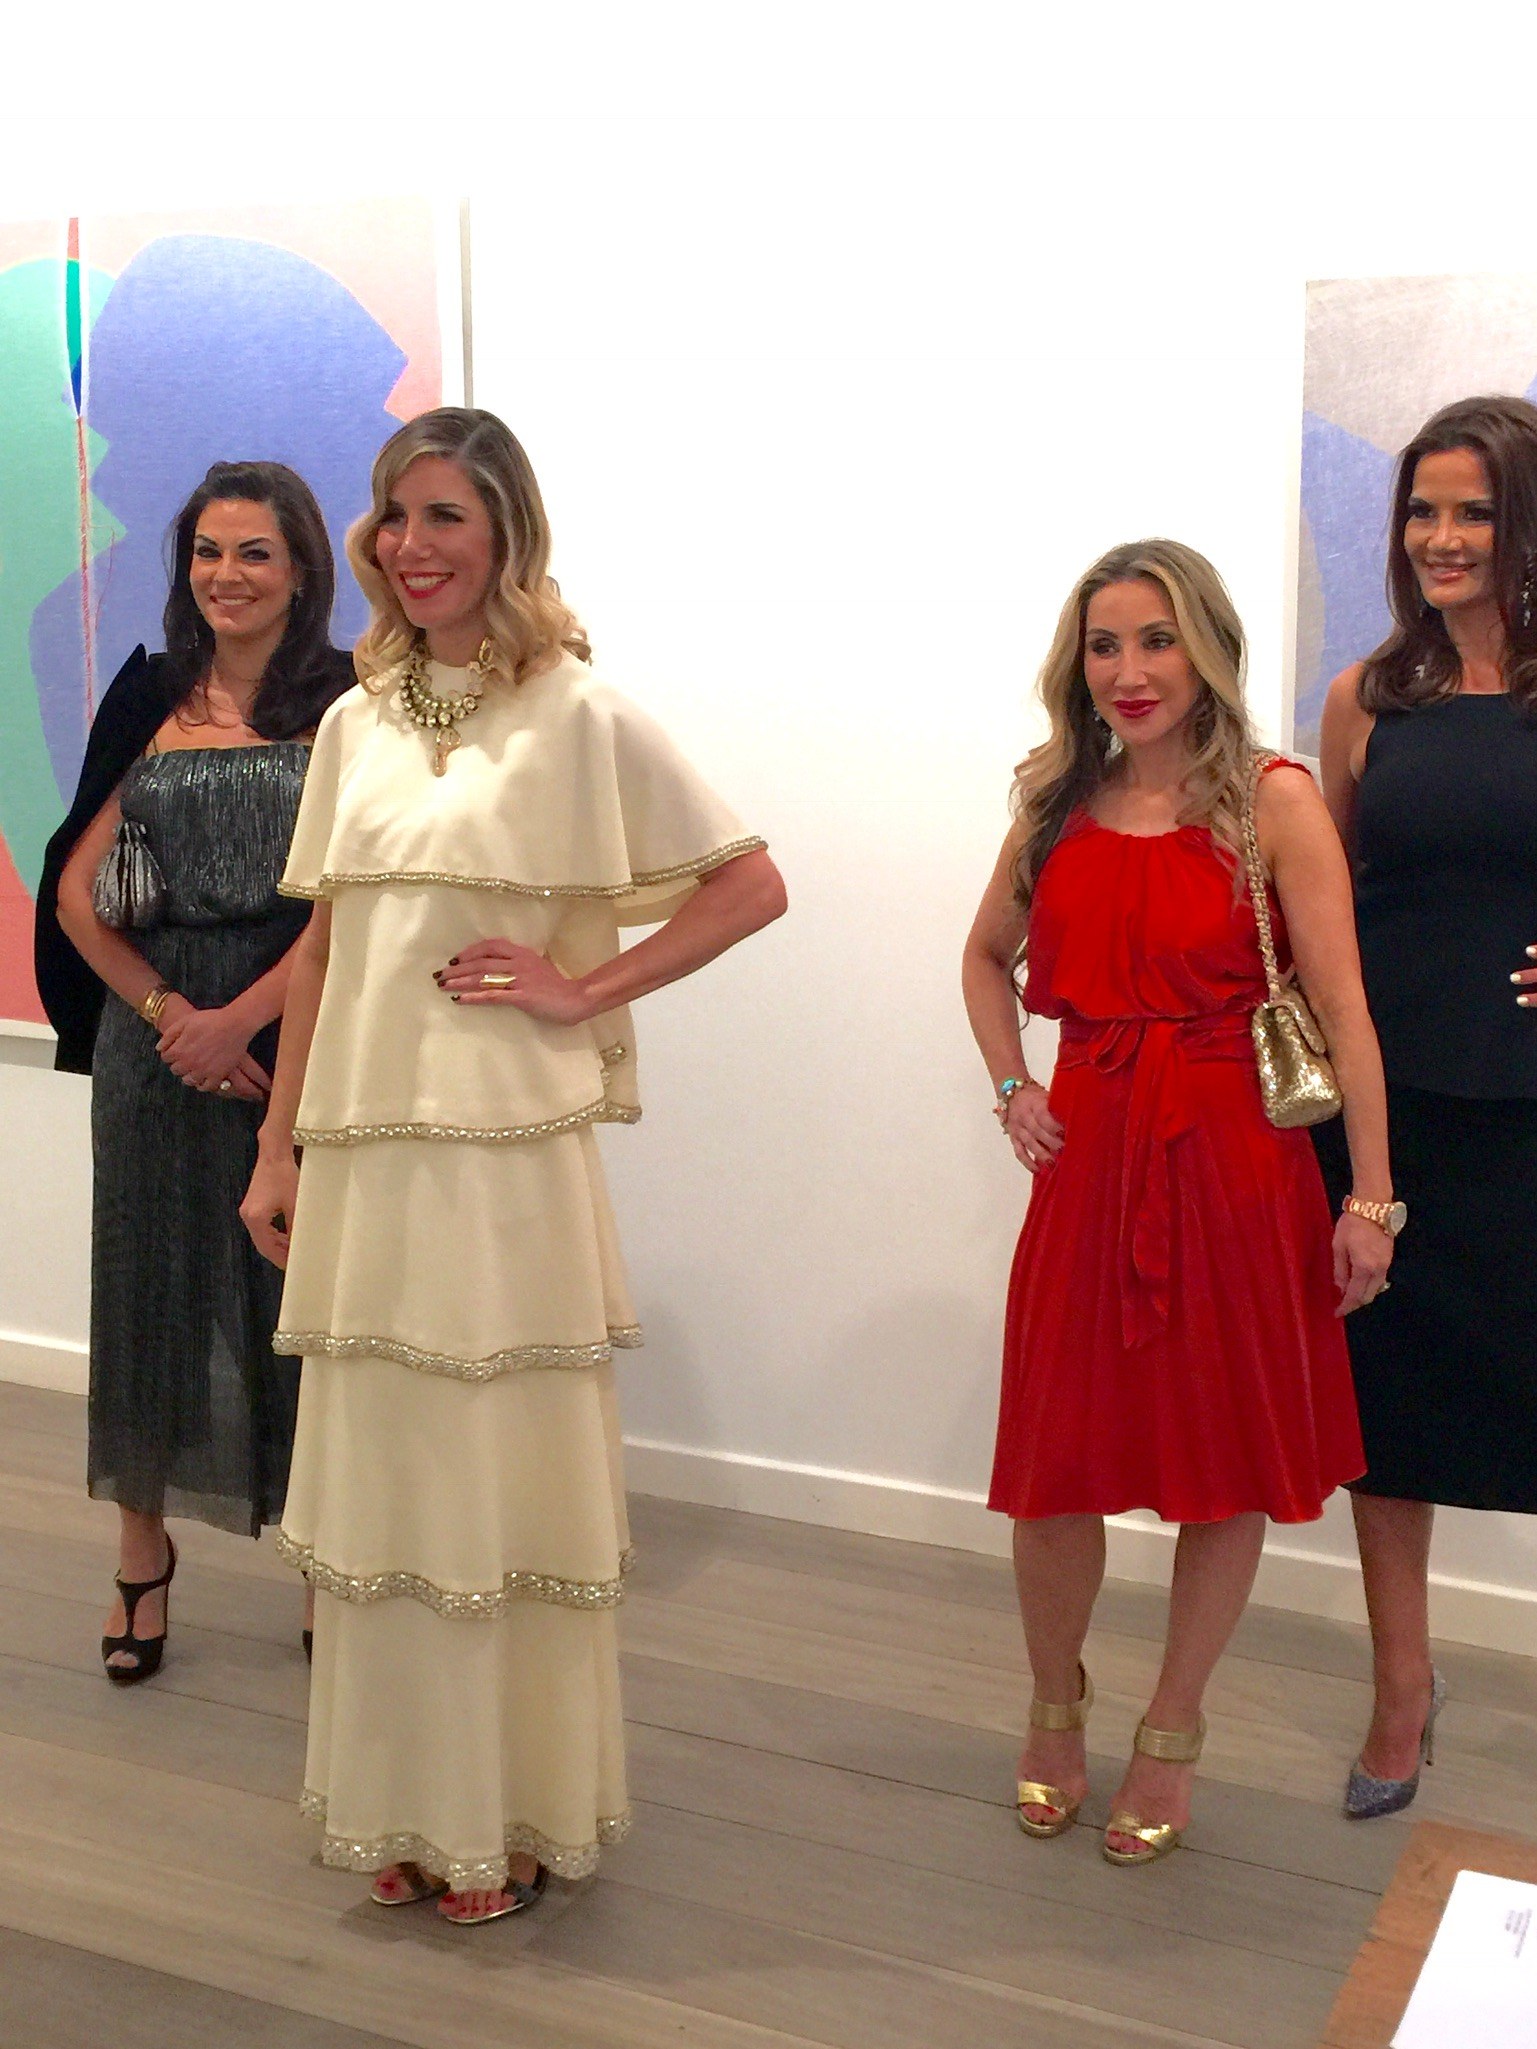 Nicole, AthenaX, Matty and Krissy and Athena Xenakis's Art Exhibition at the Olsen Gallery